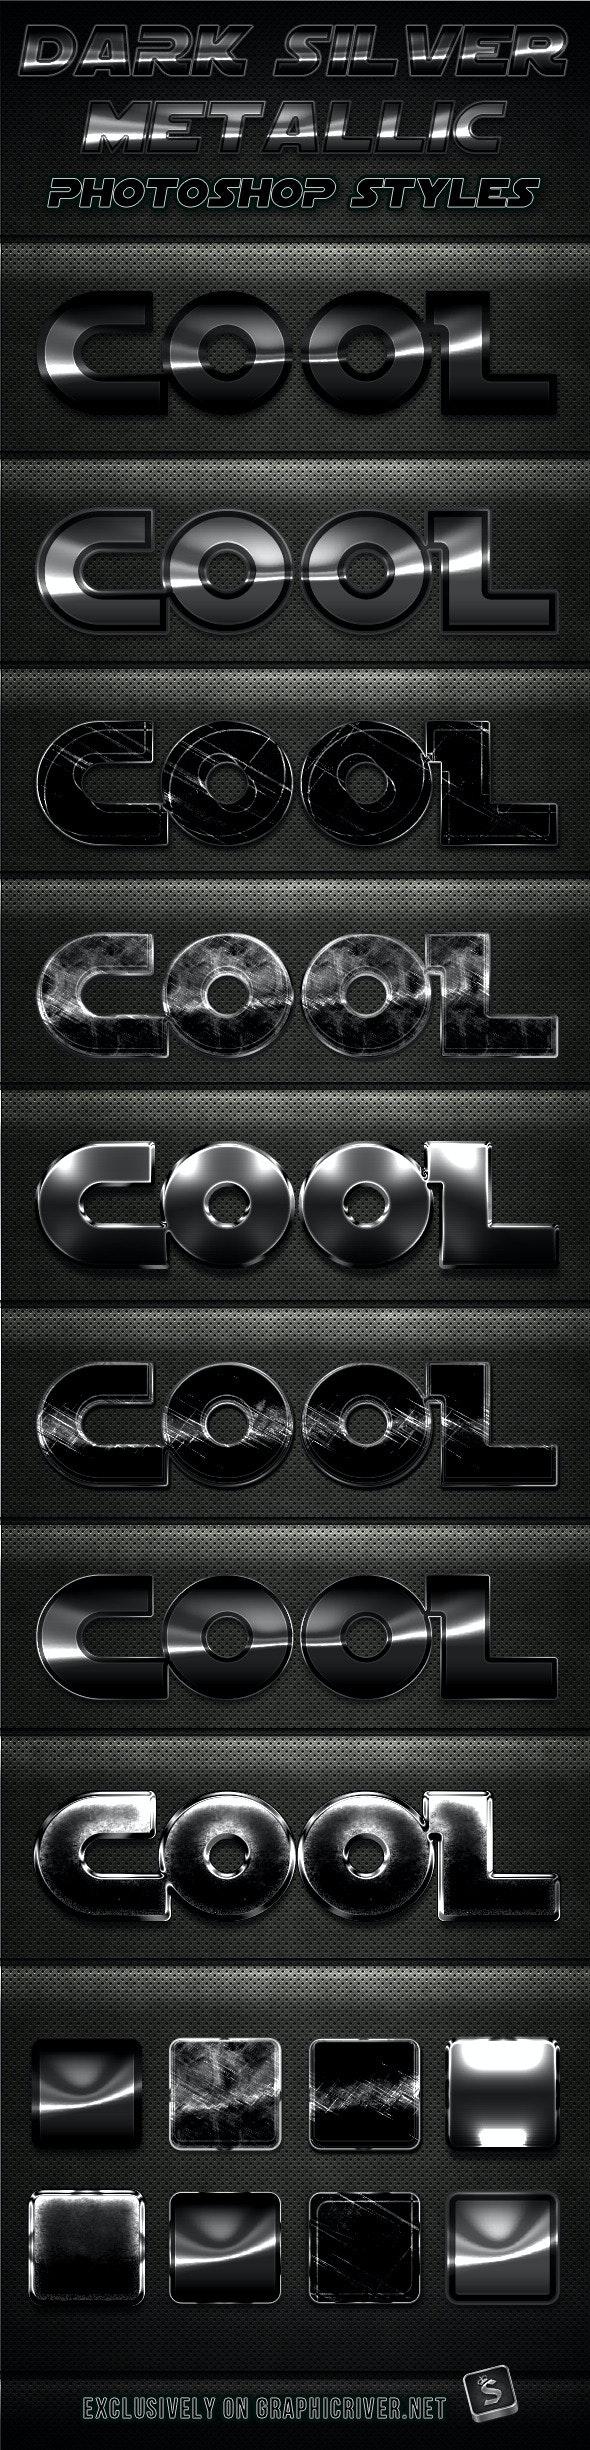 Dark Silver Metallic Photoshop Styles - Text Effects Styles